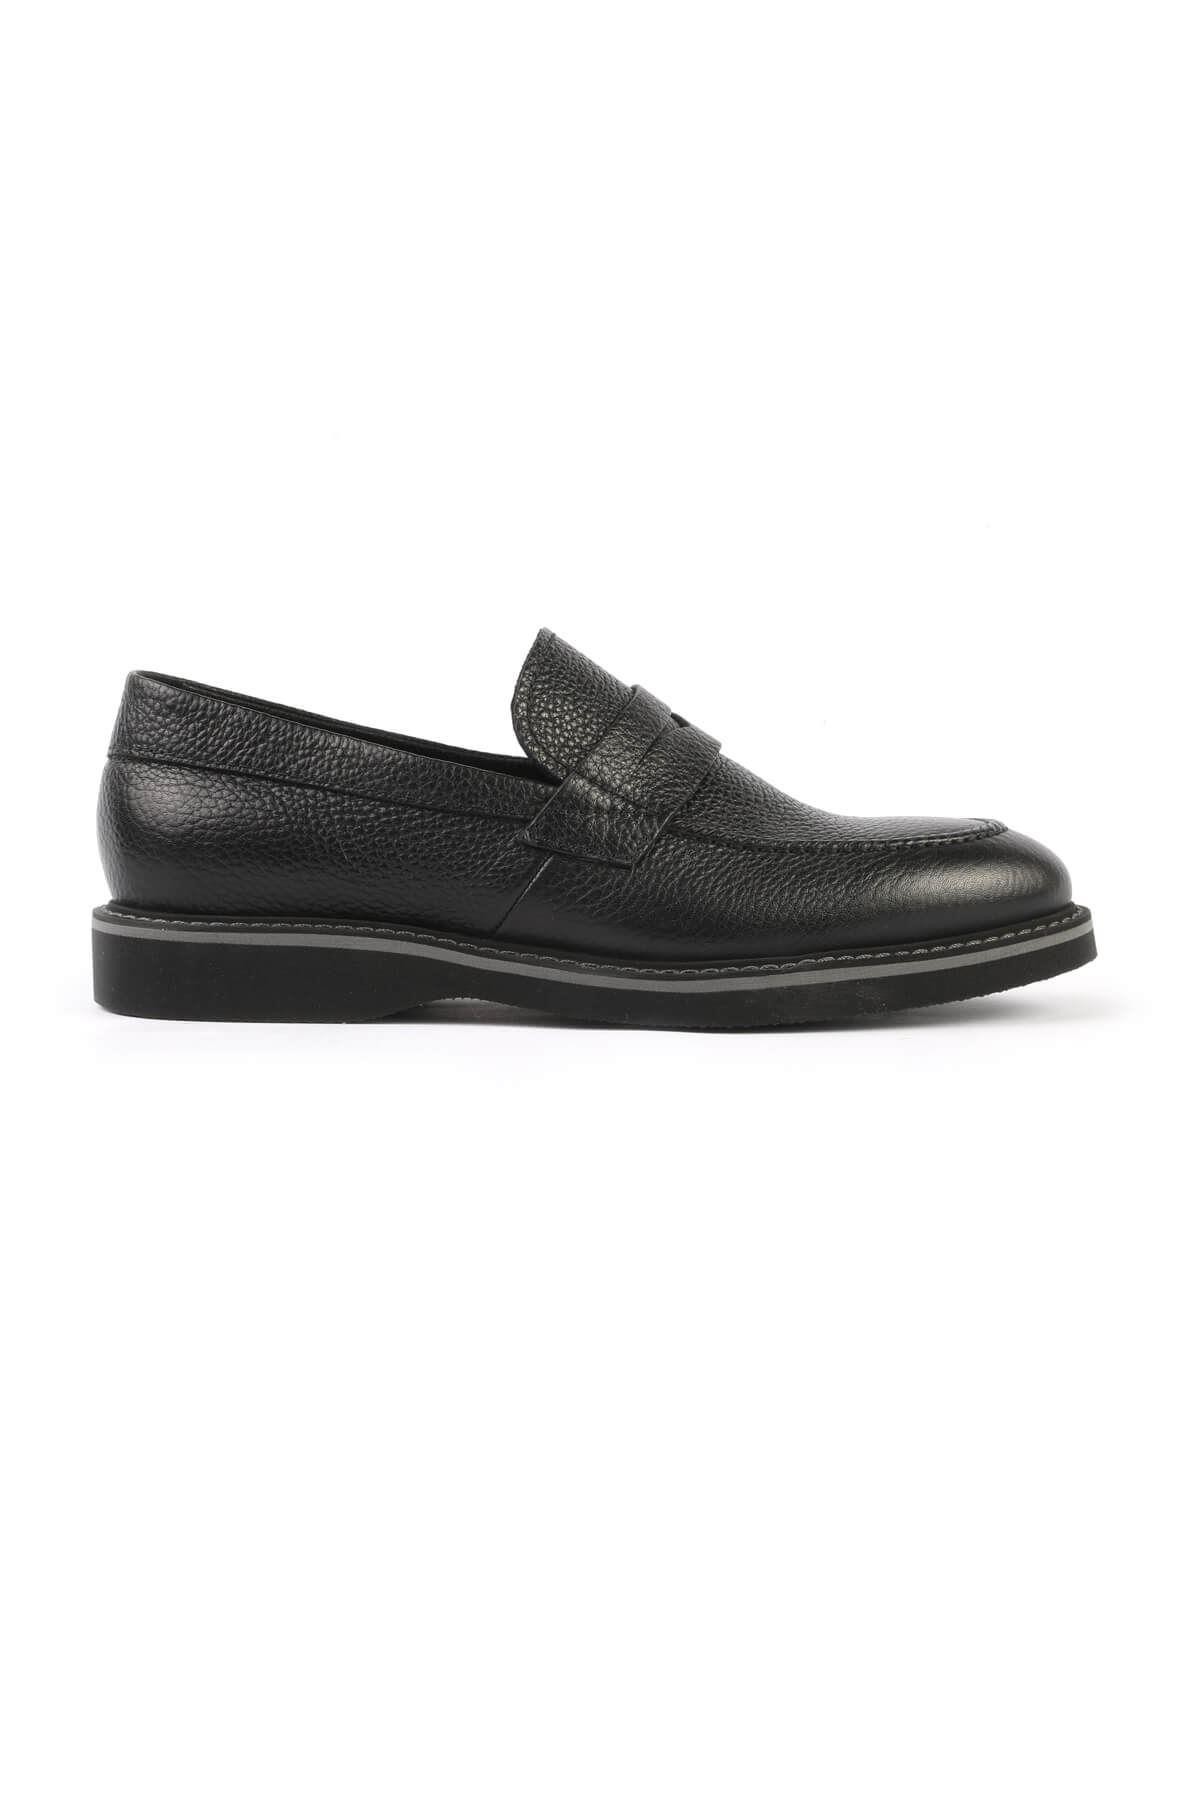 Libero 2695 Black Loafer Shoes